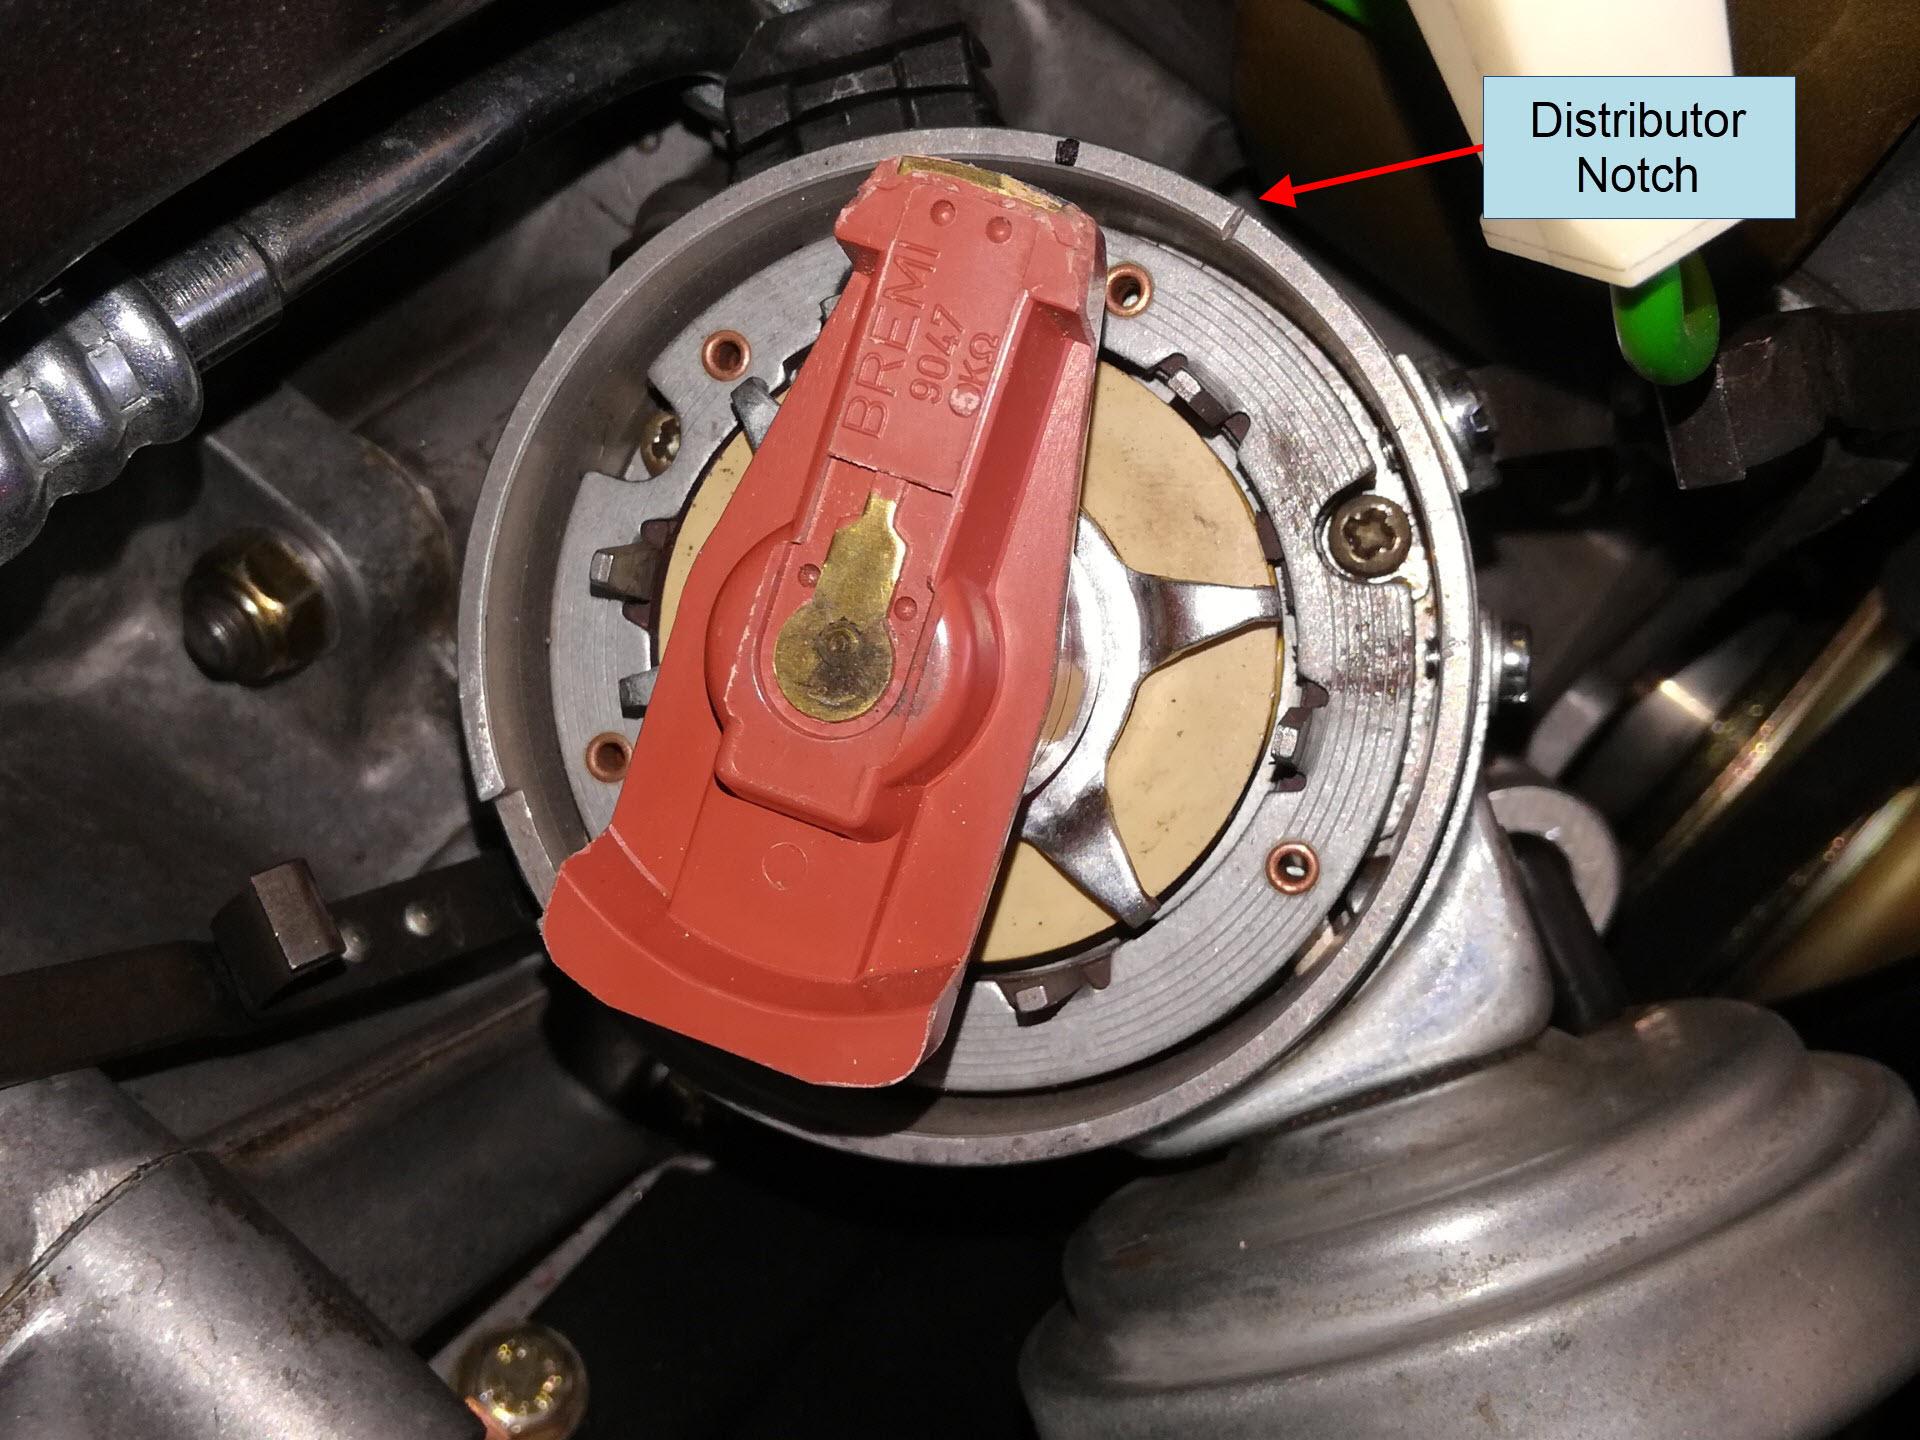 Air-cooled Porsche 911 distributor at TDC cylinder 1